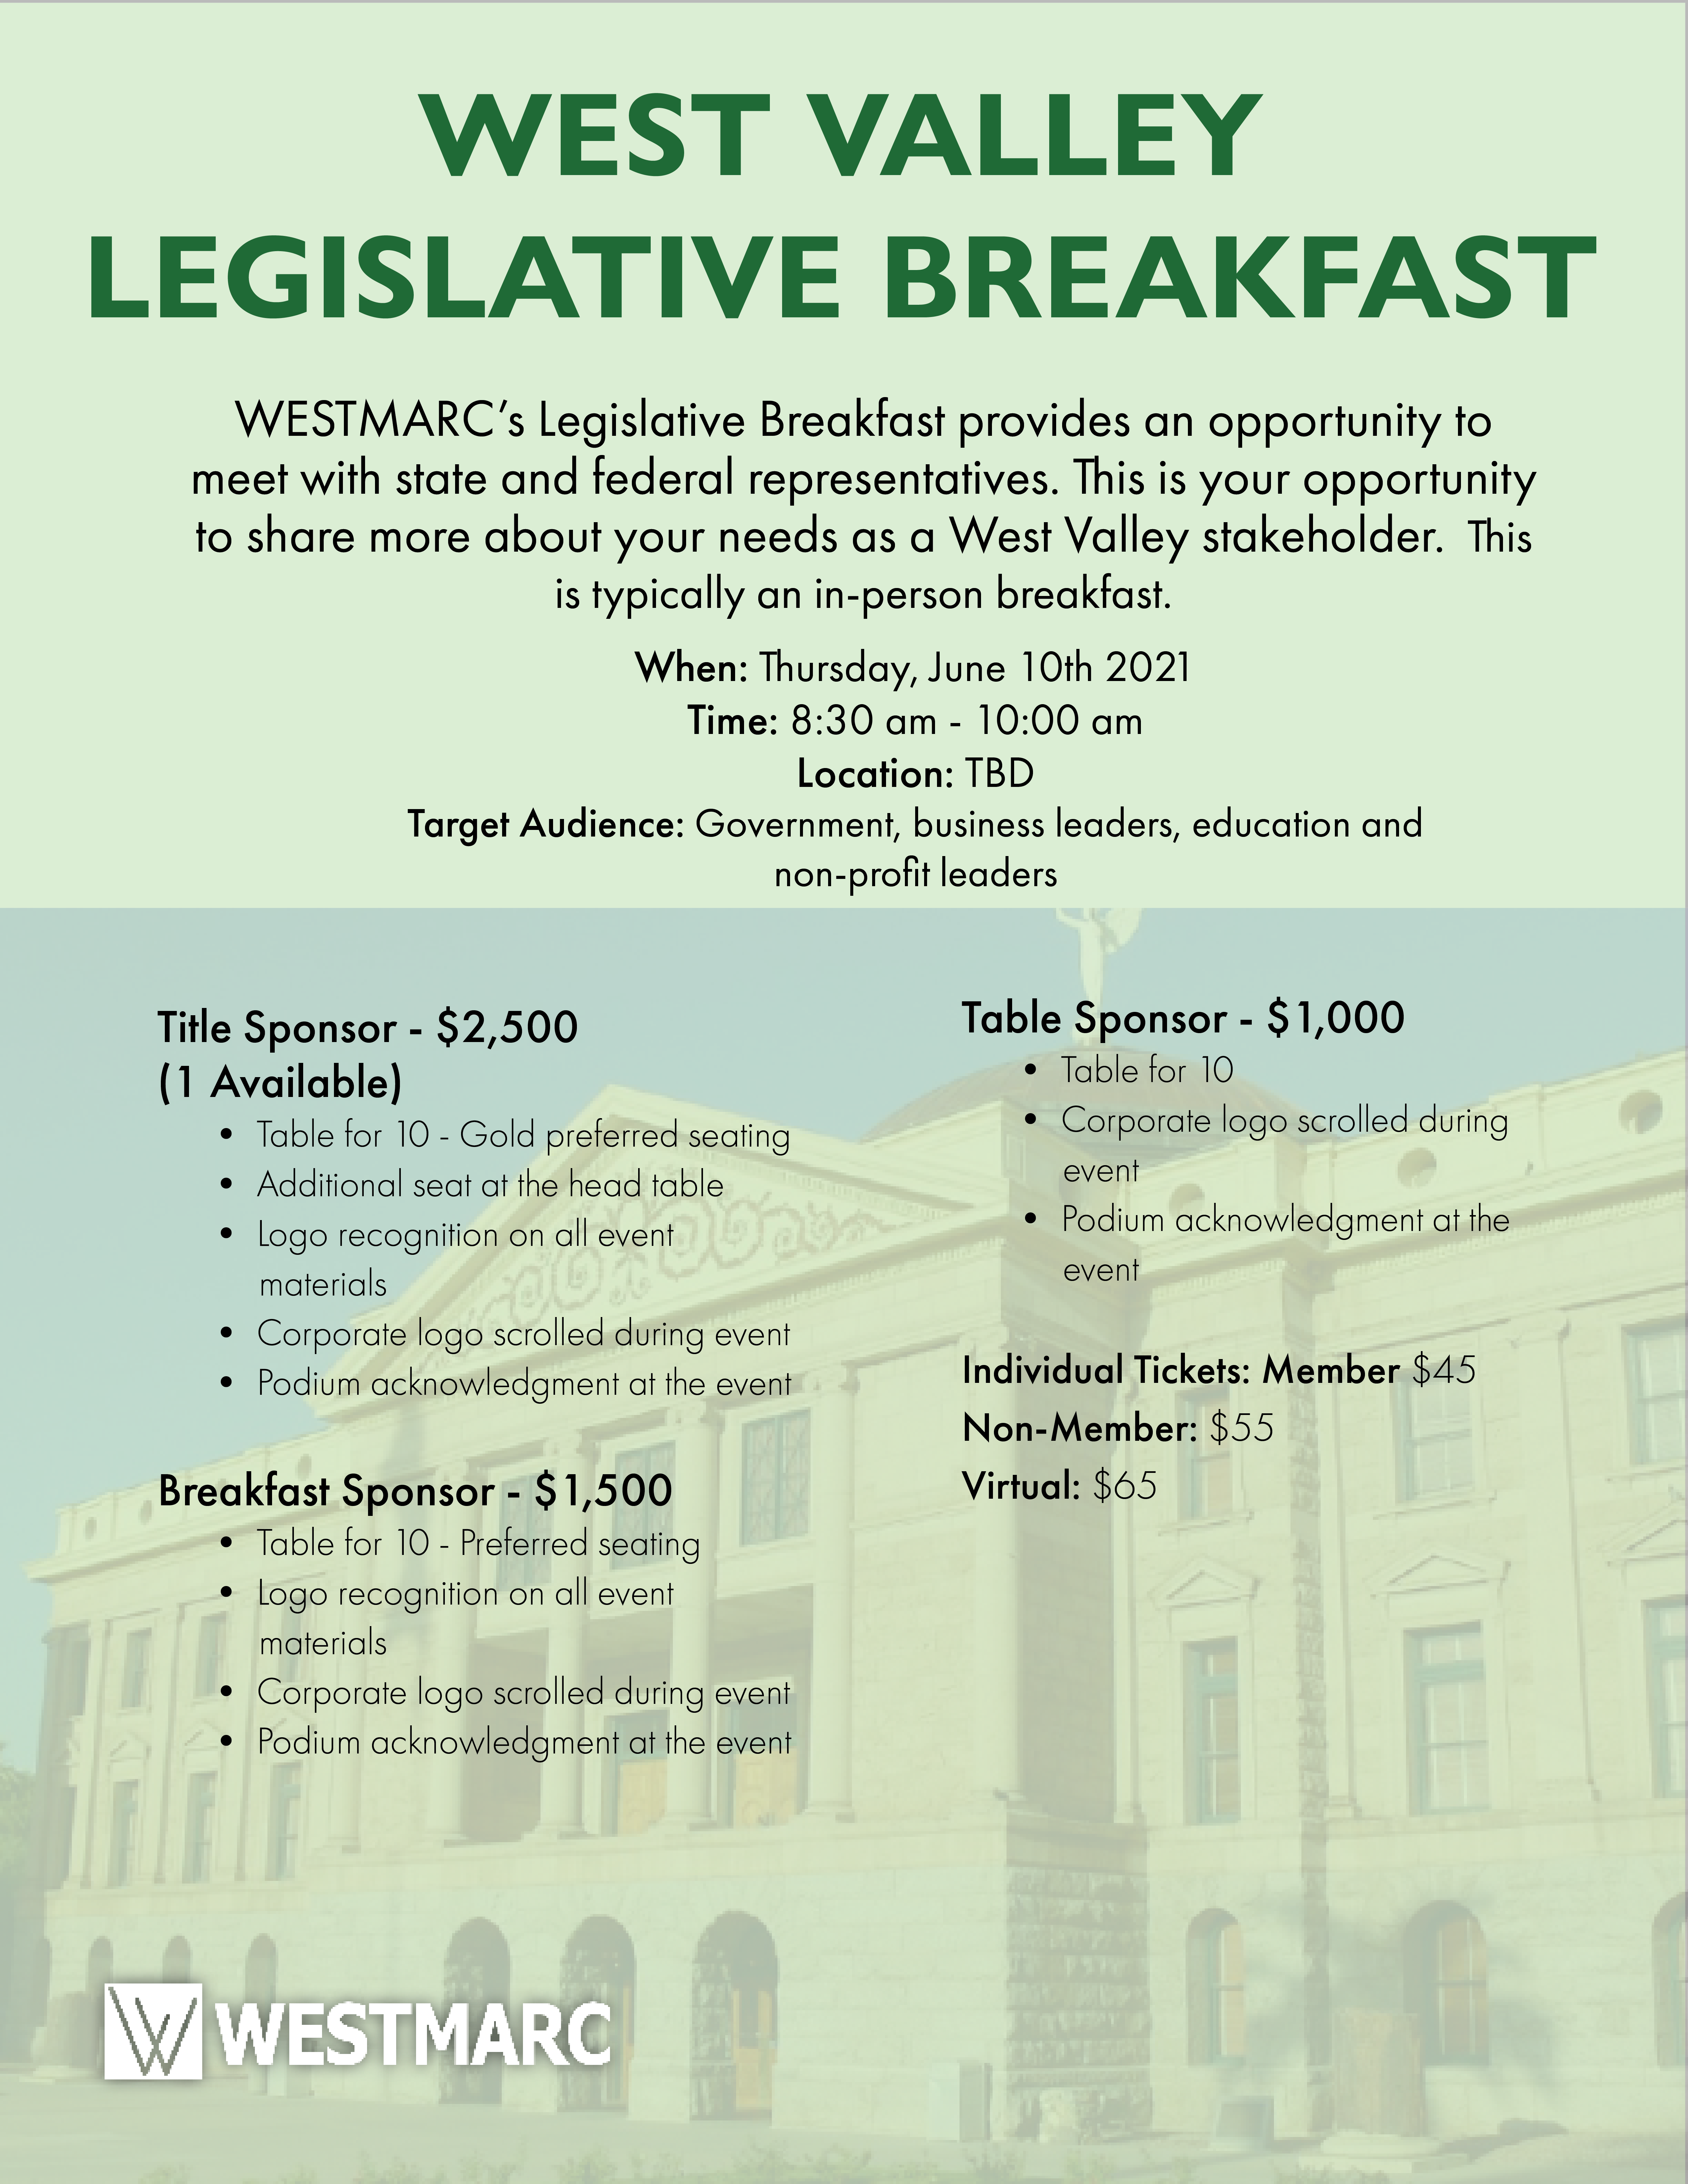 West Valley Legislative Breakfast